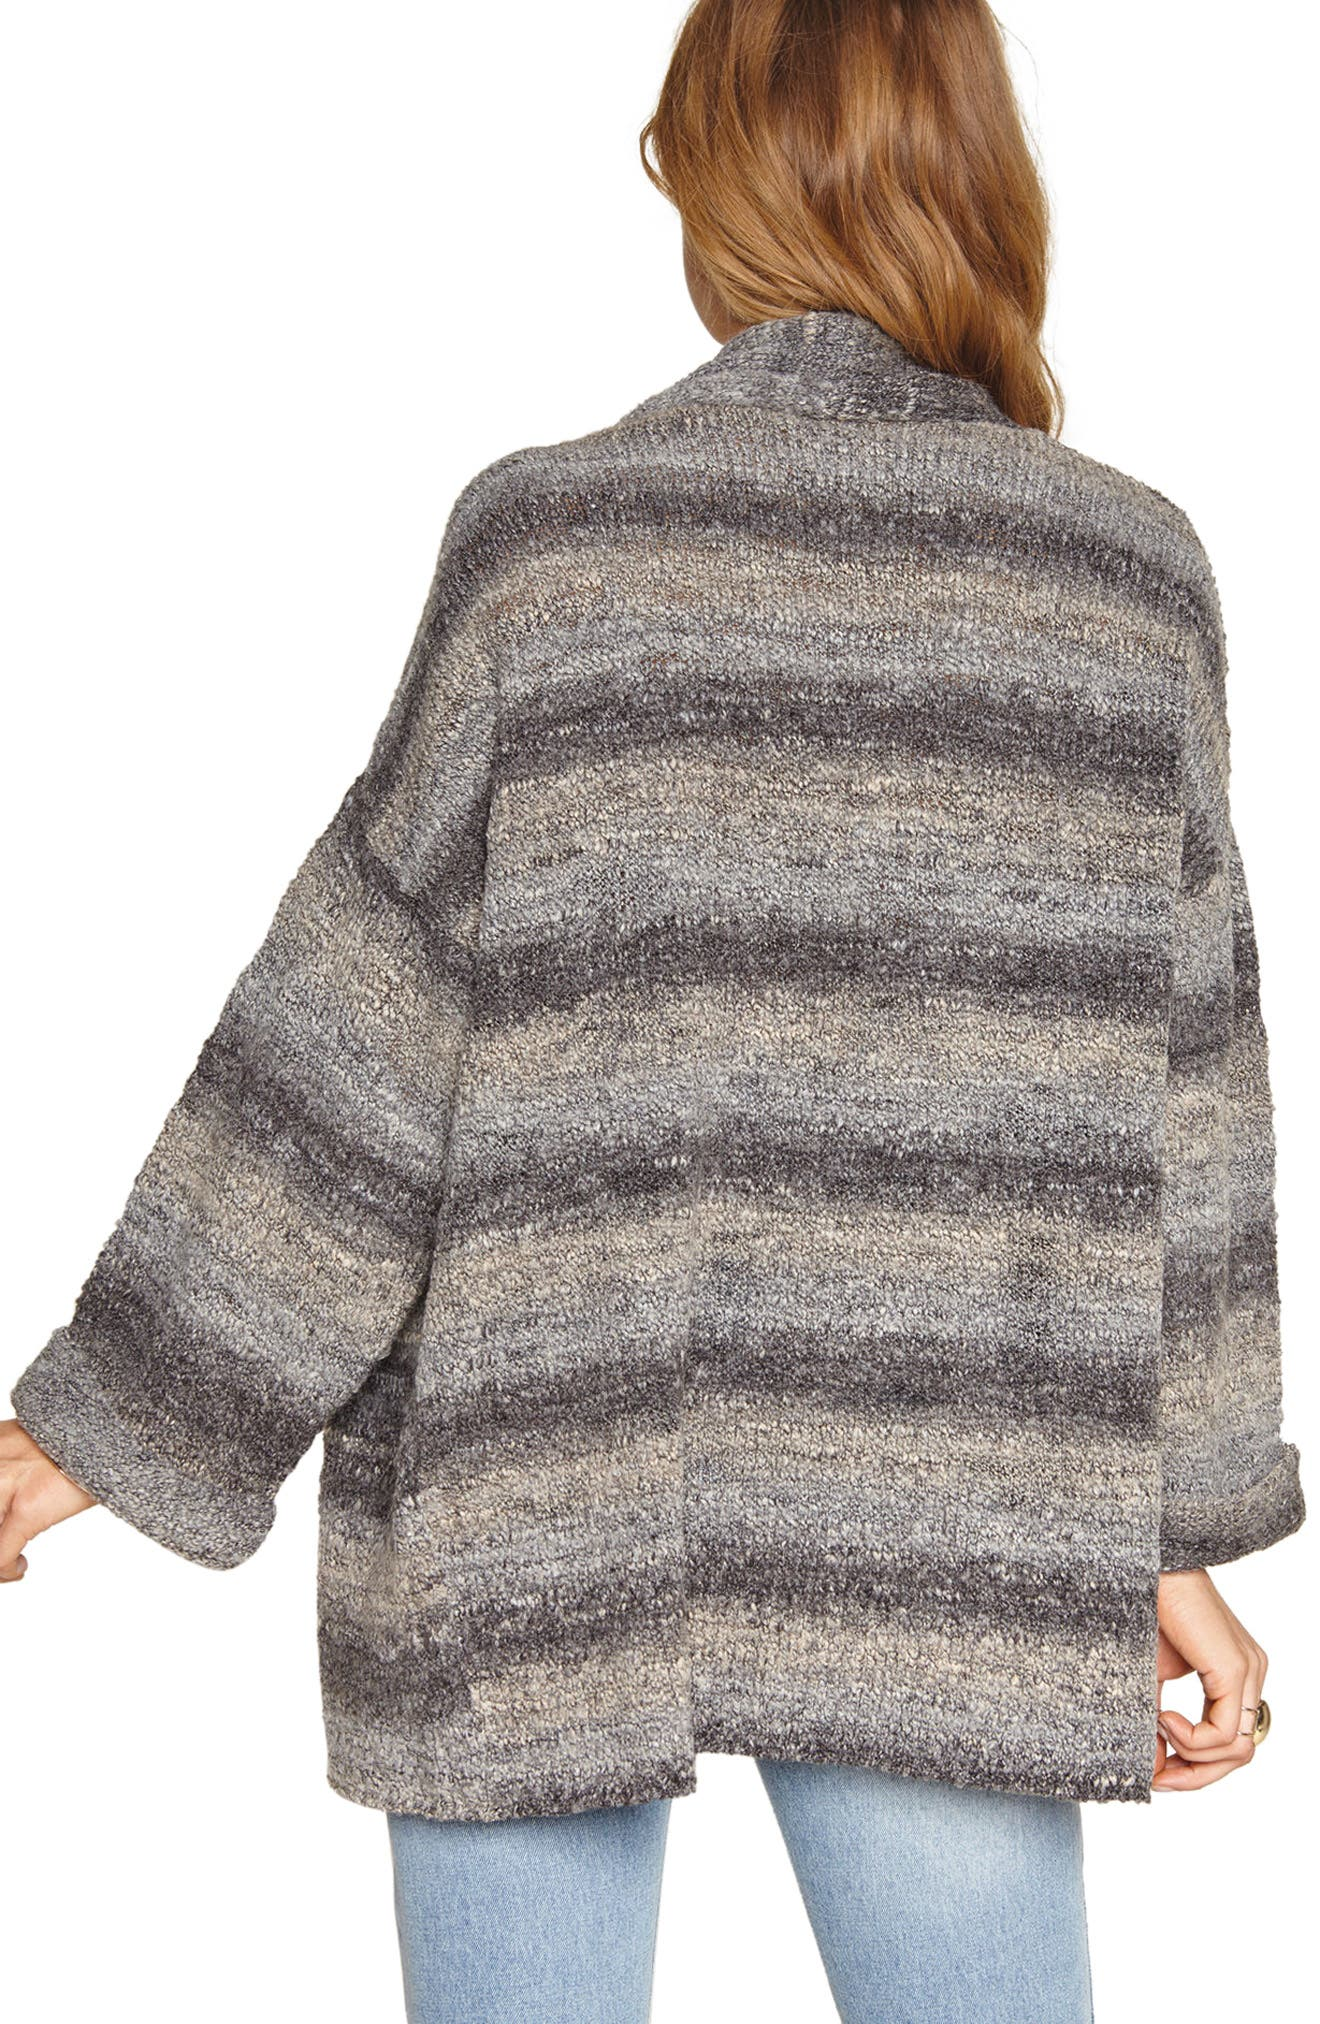 Beckett Stripe Sweater,                             Alternate thumbnail 2, color,                             020